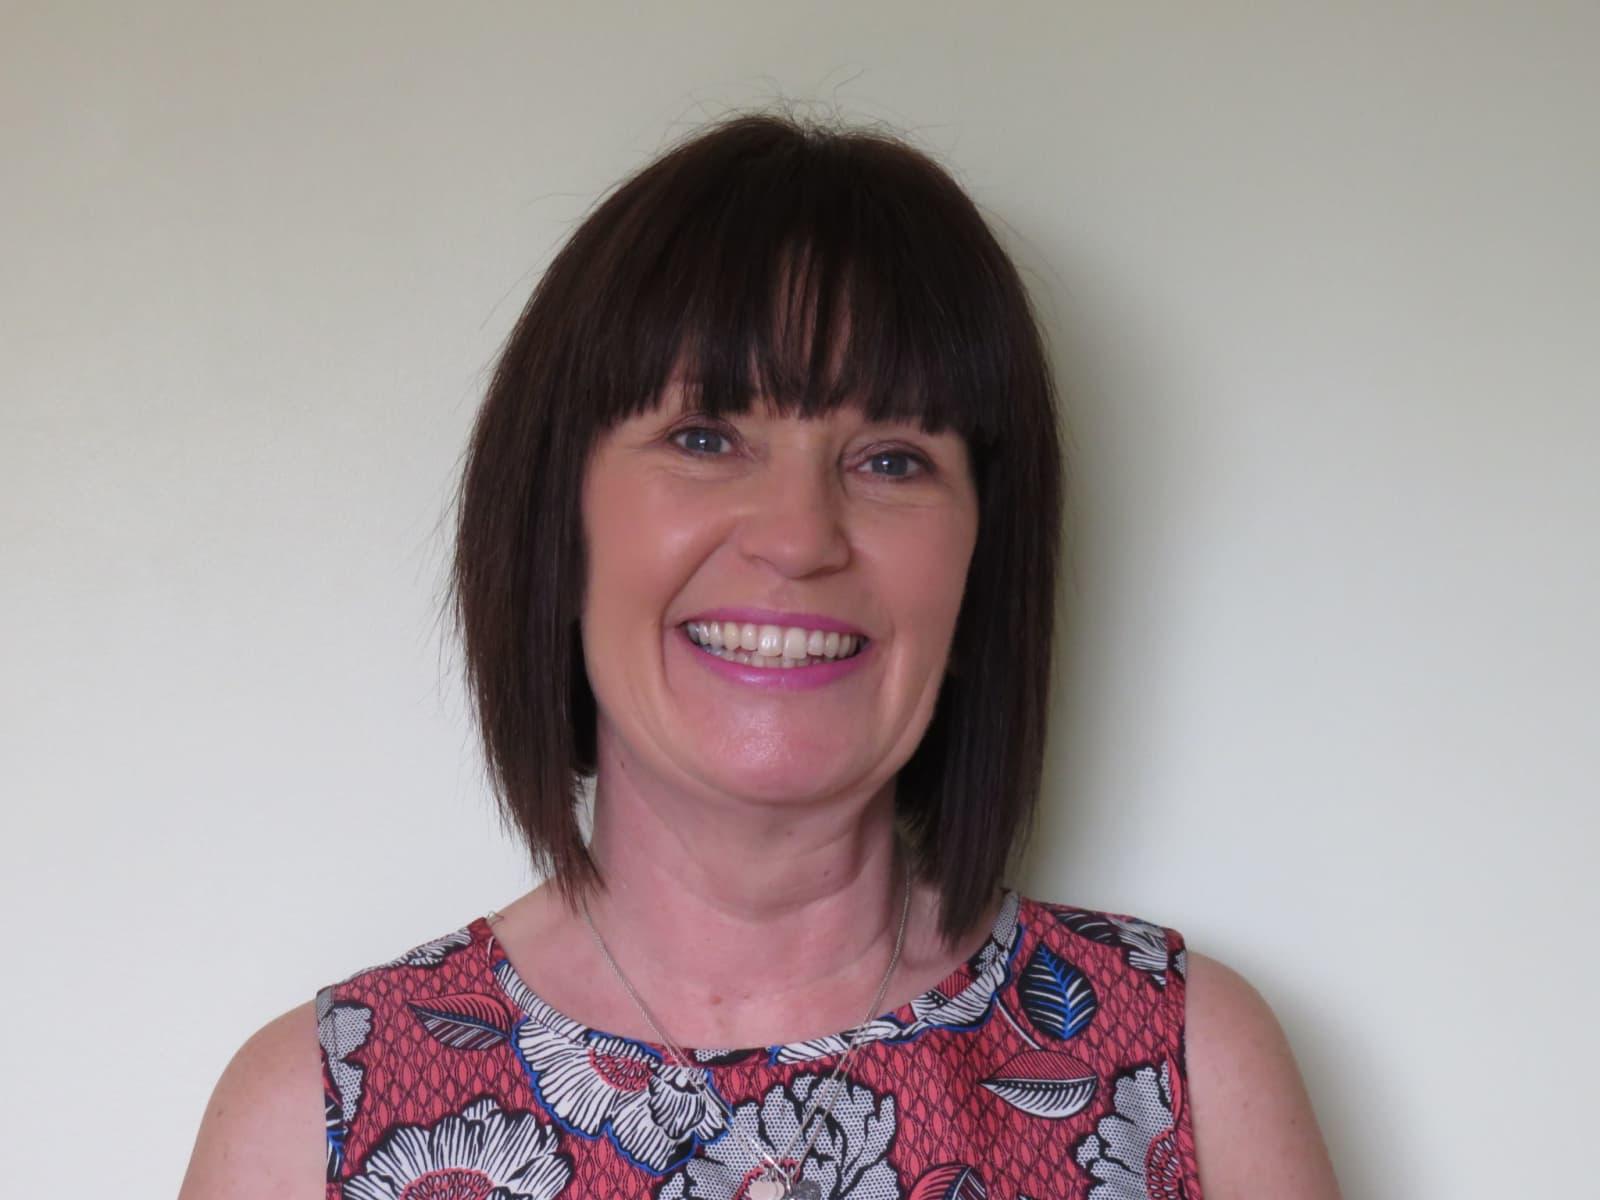 Lesley from Wallingford, United Kingdom